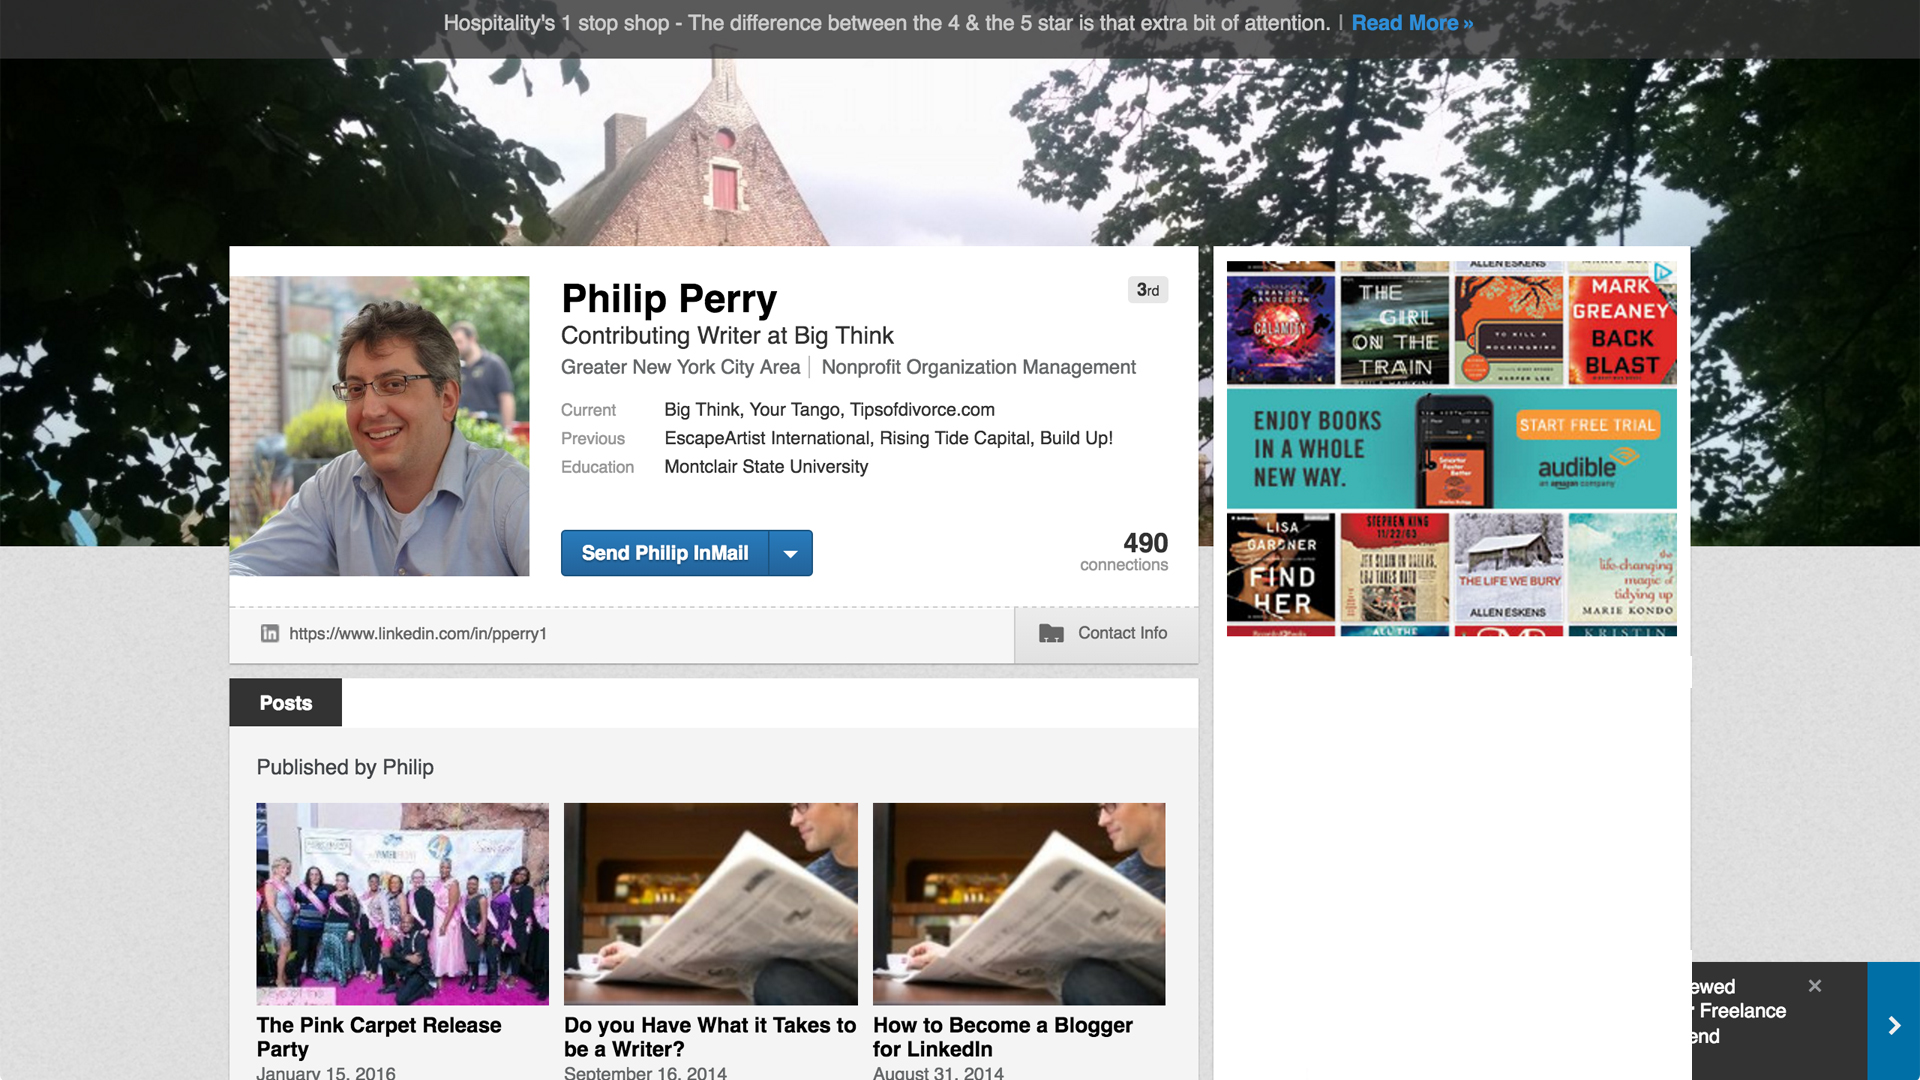 linkedin.com/in/pperry1?trk=hp-identity-name